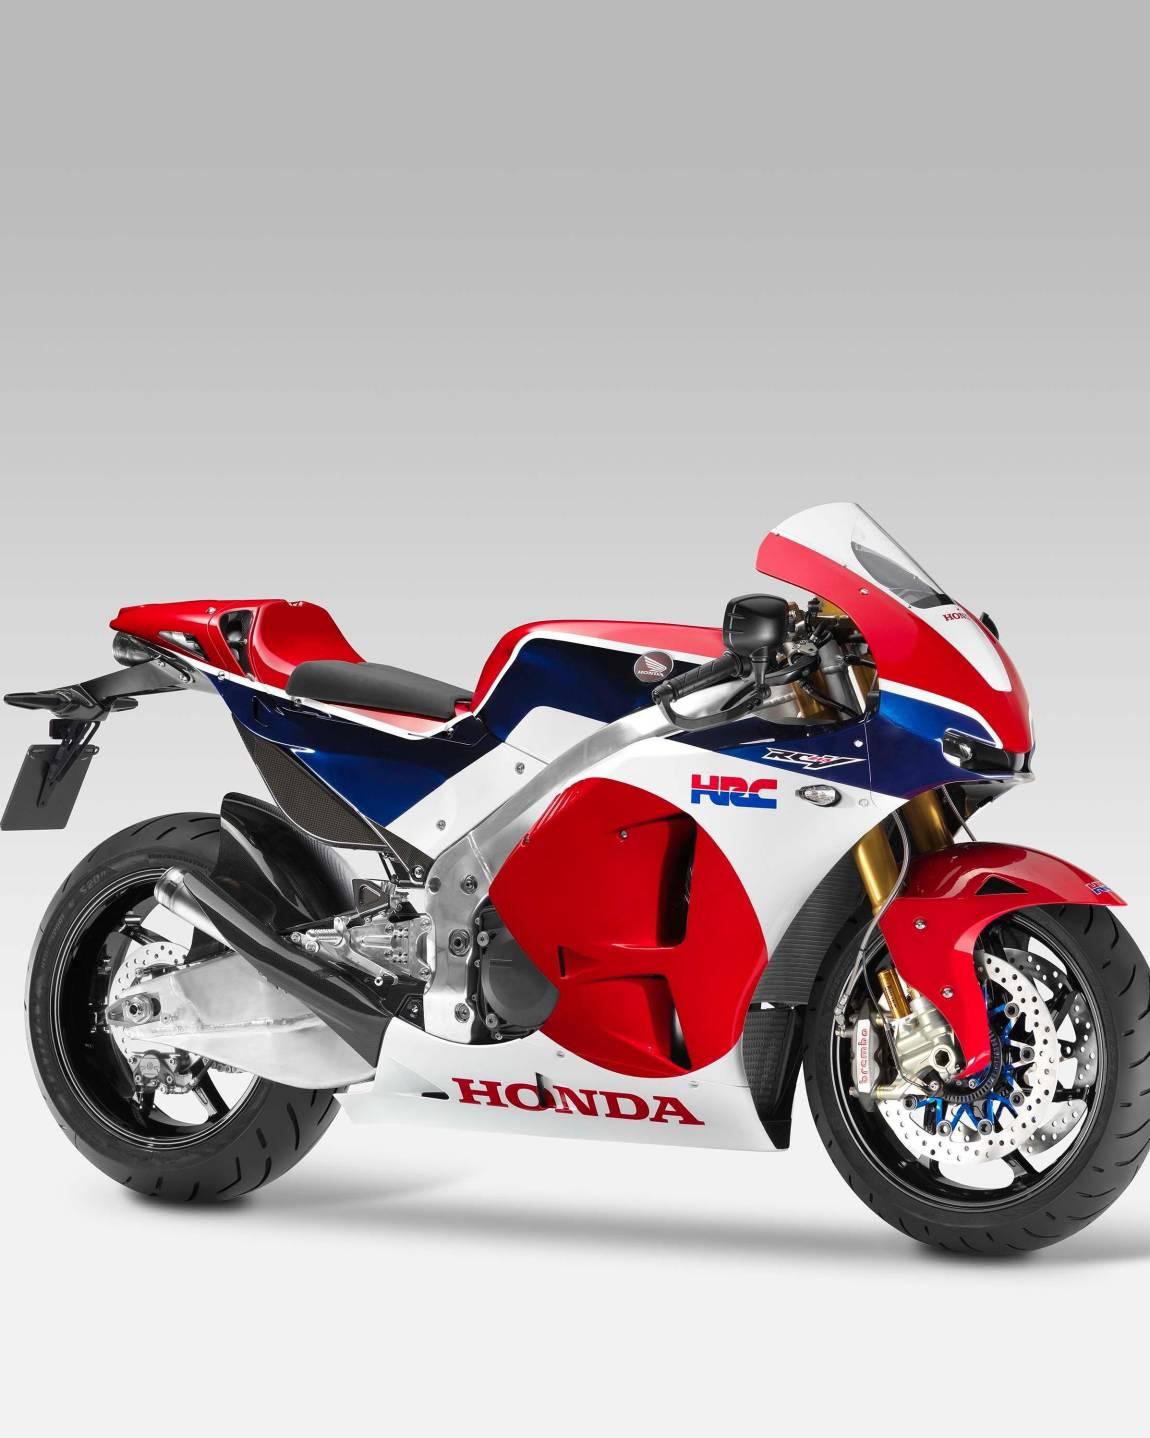 New Honda 300cc Bike In Indium